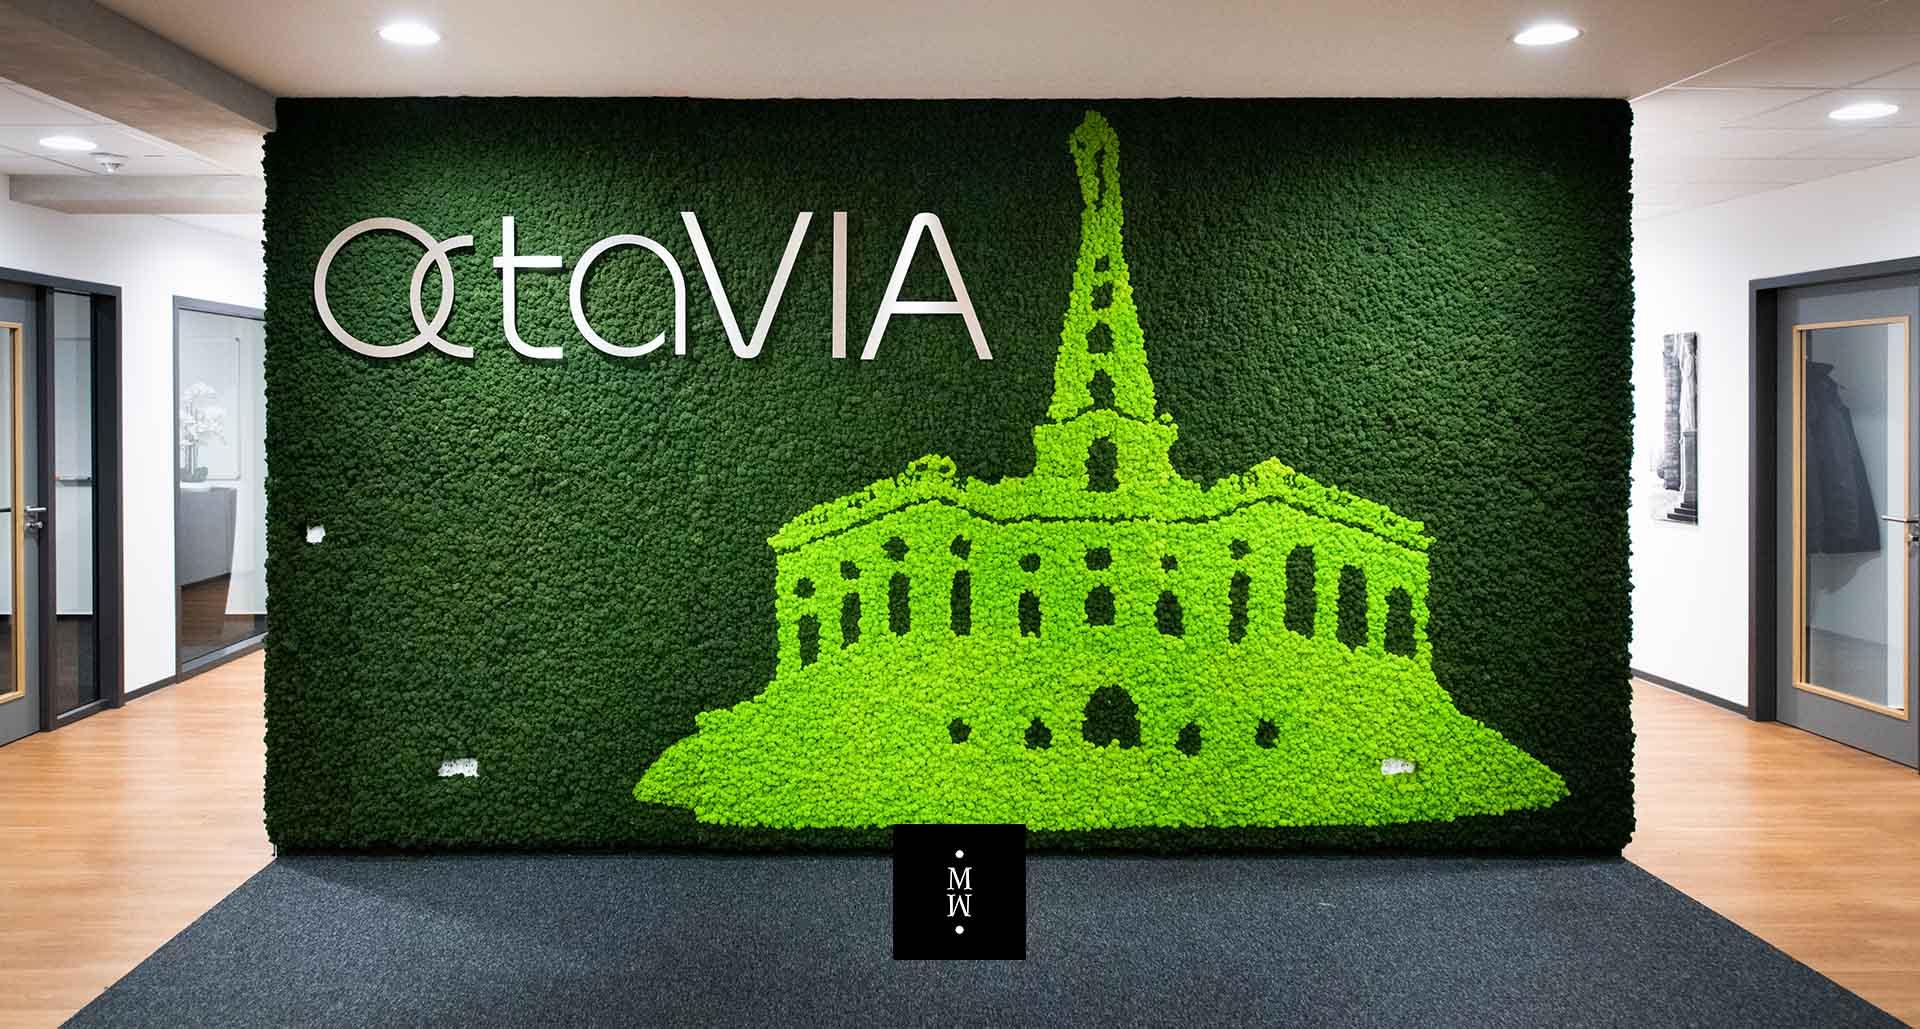 Mooswand Islandmoos mit Acrylbuchstaben Octavia